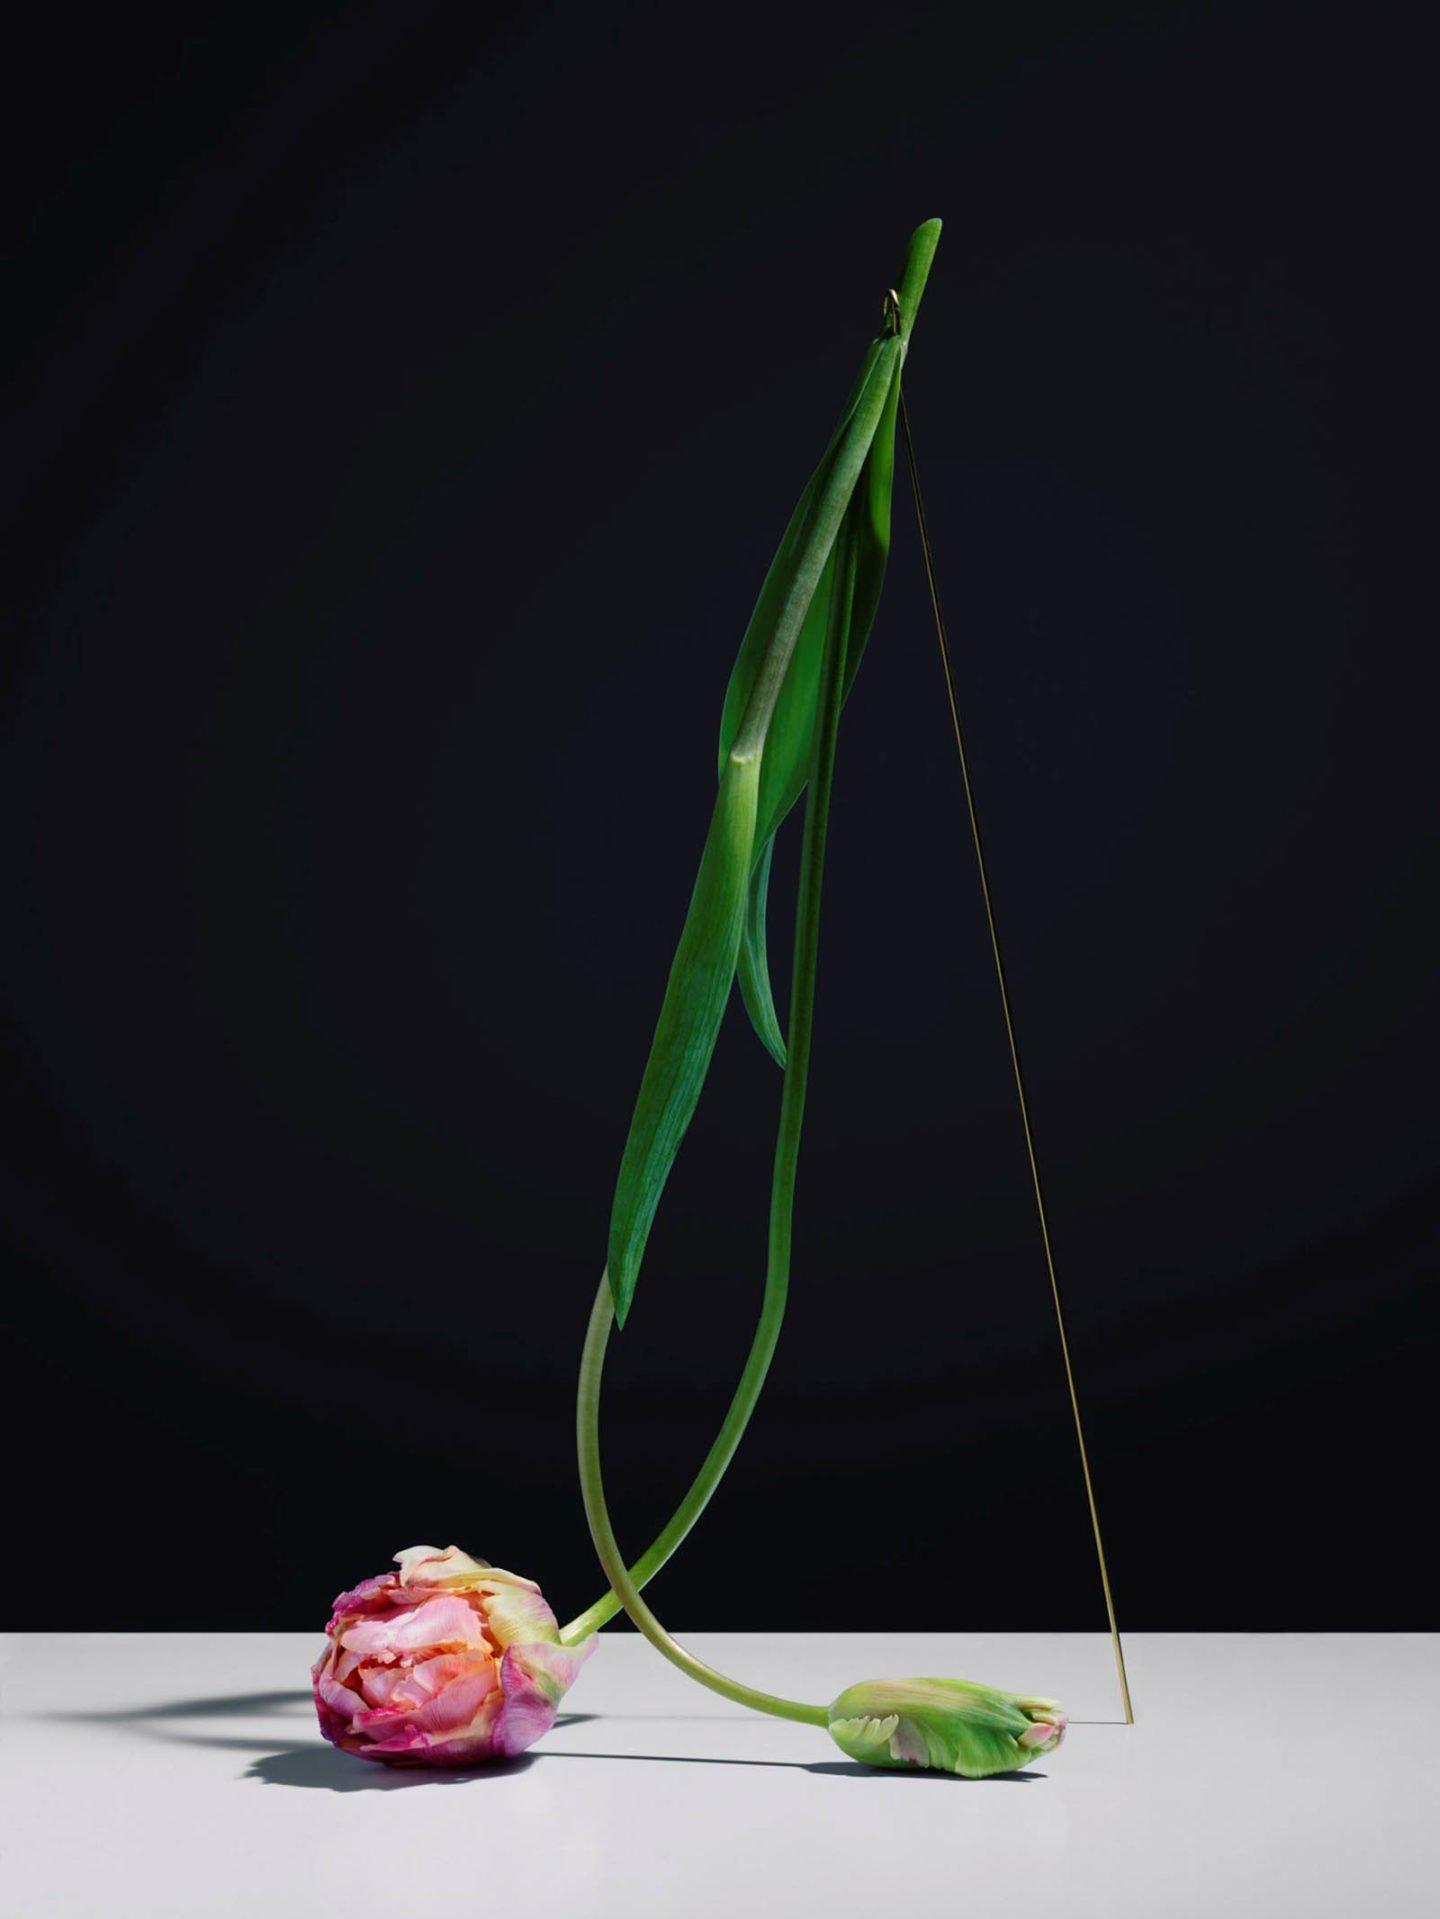 ignant-art-carl-kleiner-postures-006-1440x1919